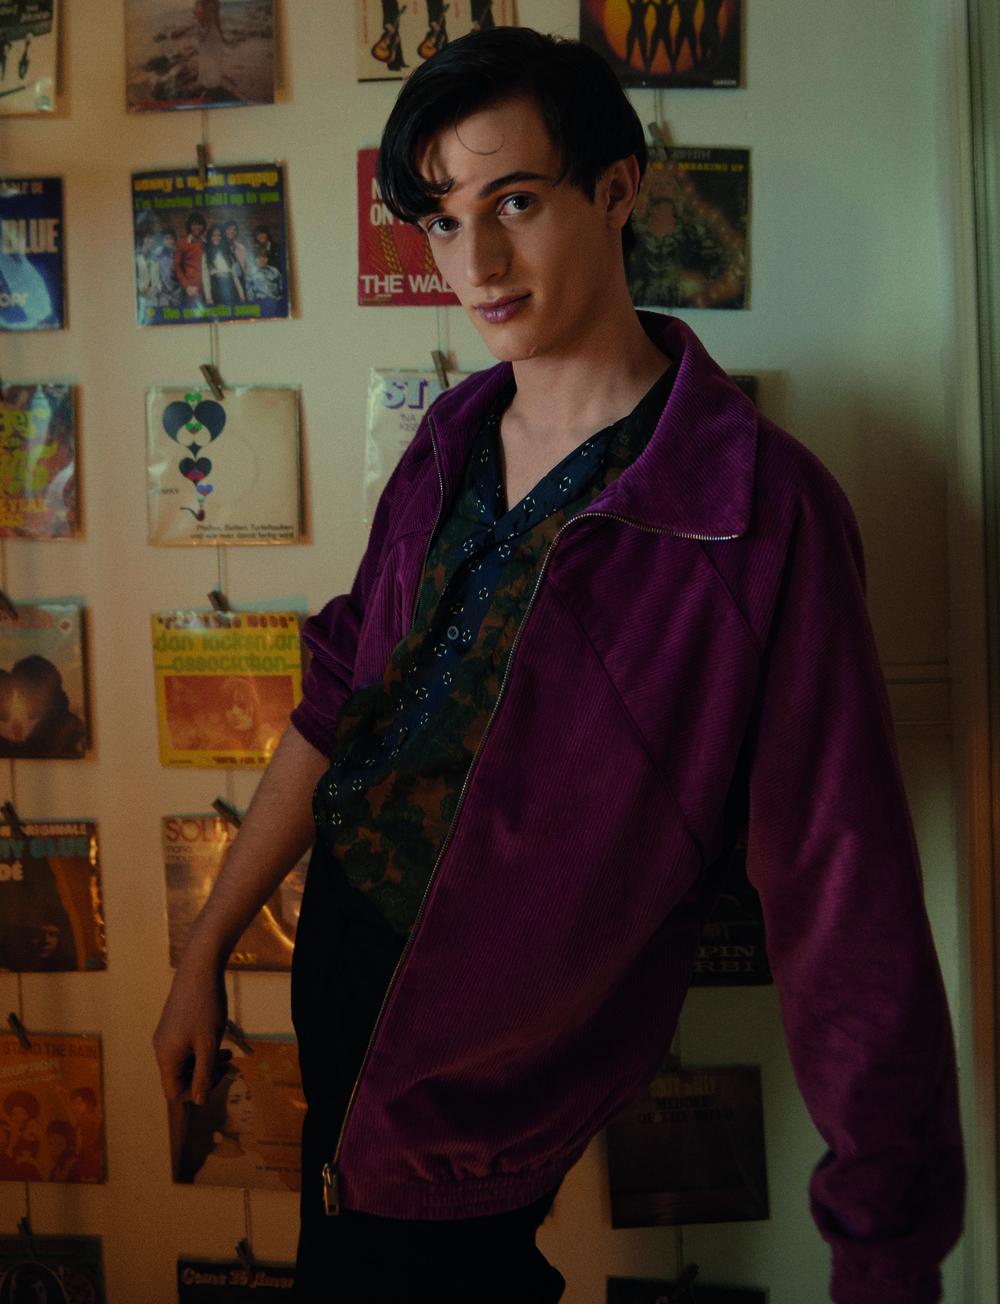 Jacket  BALLY   Shirt  DRIES VAN NOTEN  Trousers  ISSEY MIYAKE MEN